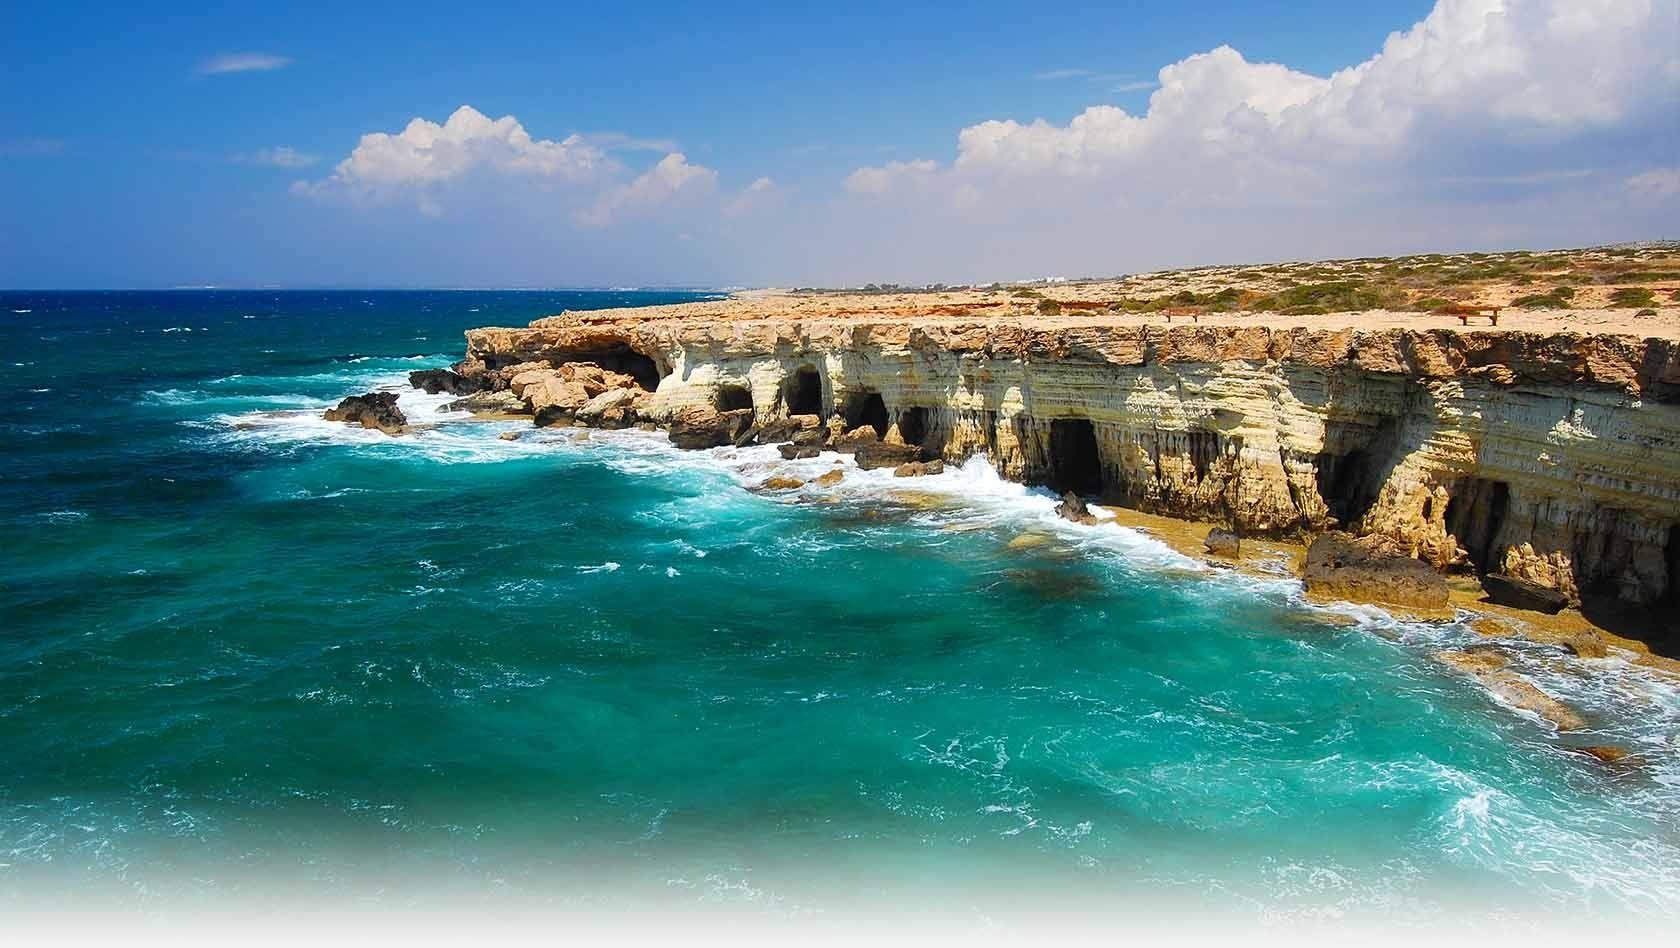 Кипр и Египет укрепляют двусторонние связи